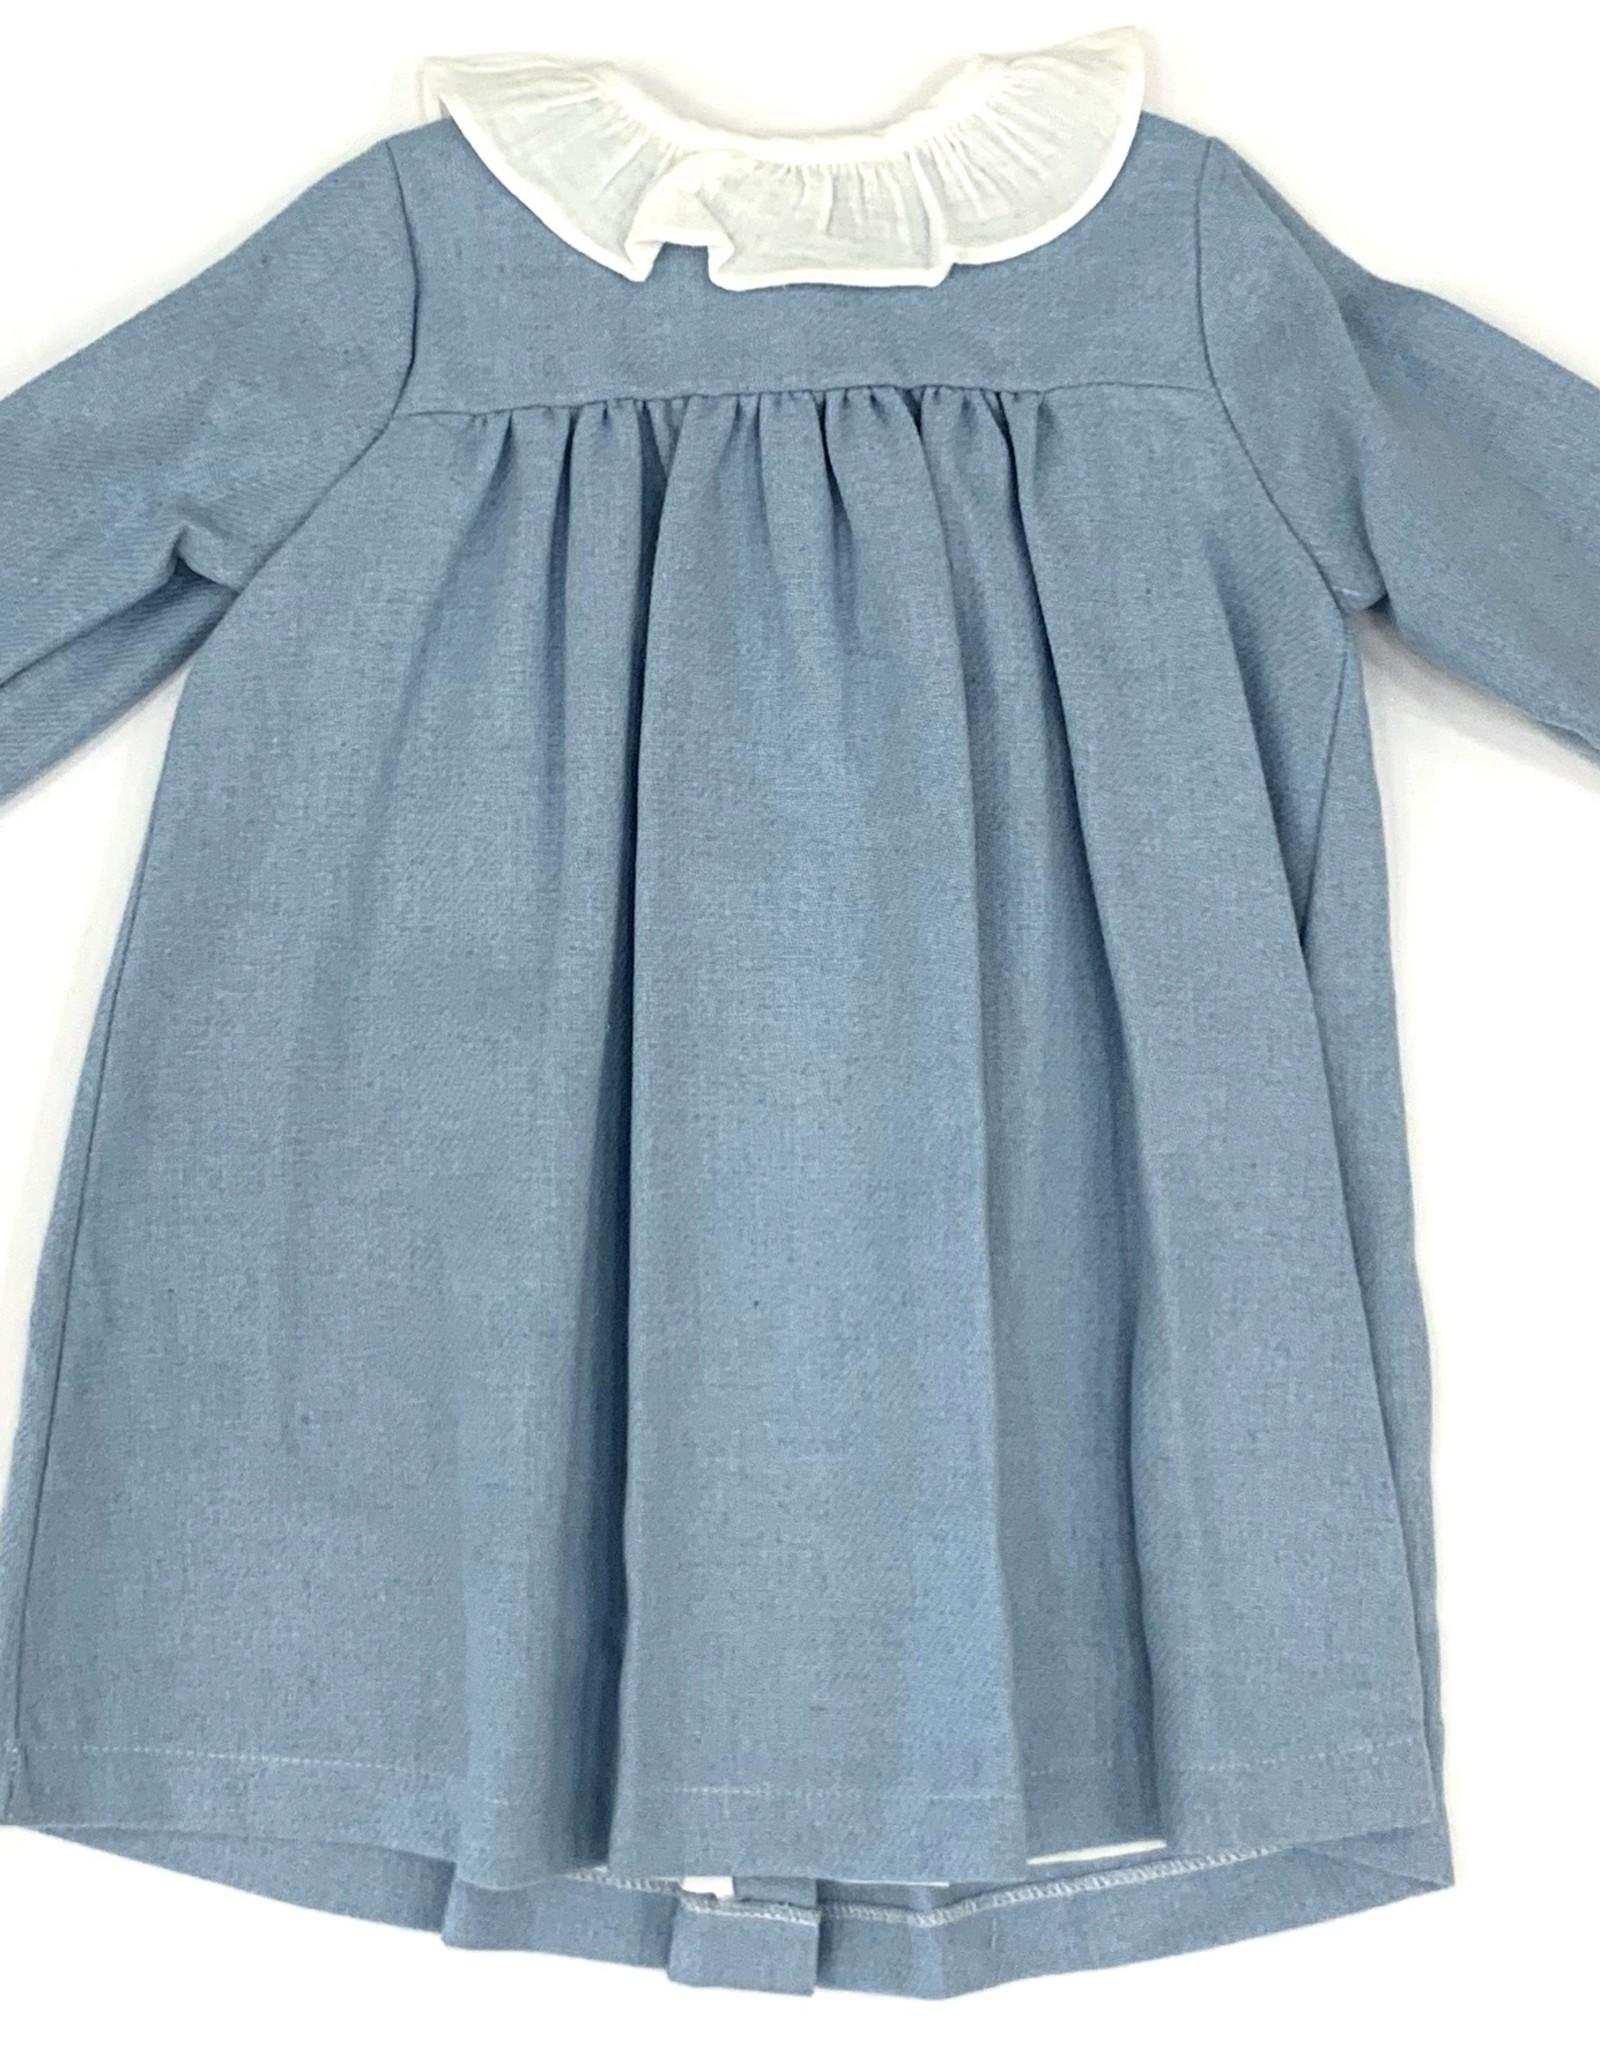 Babidu Sky Blue Dress With White Collar